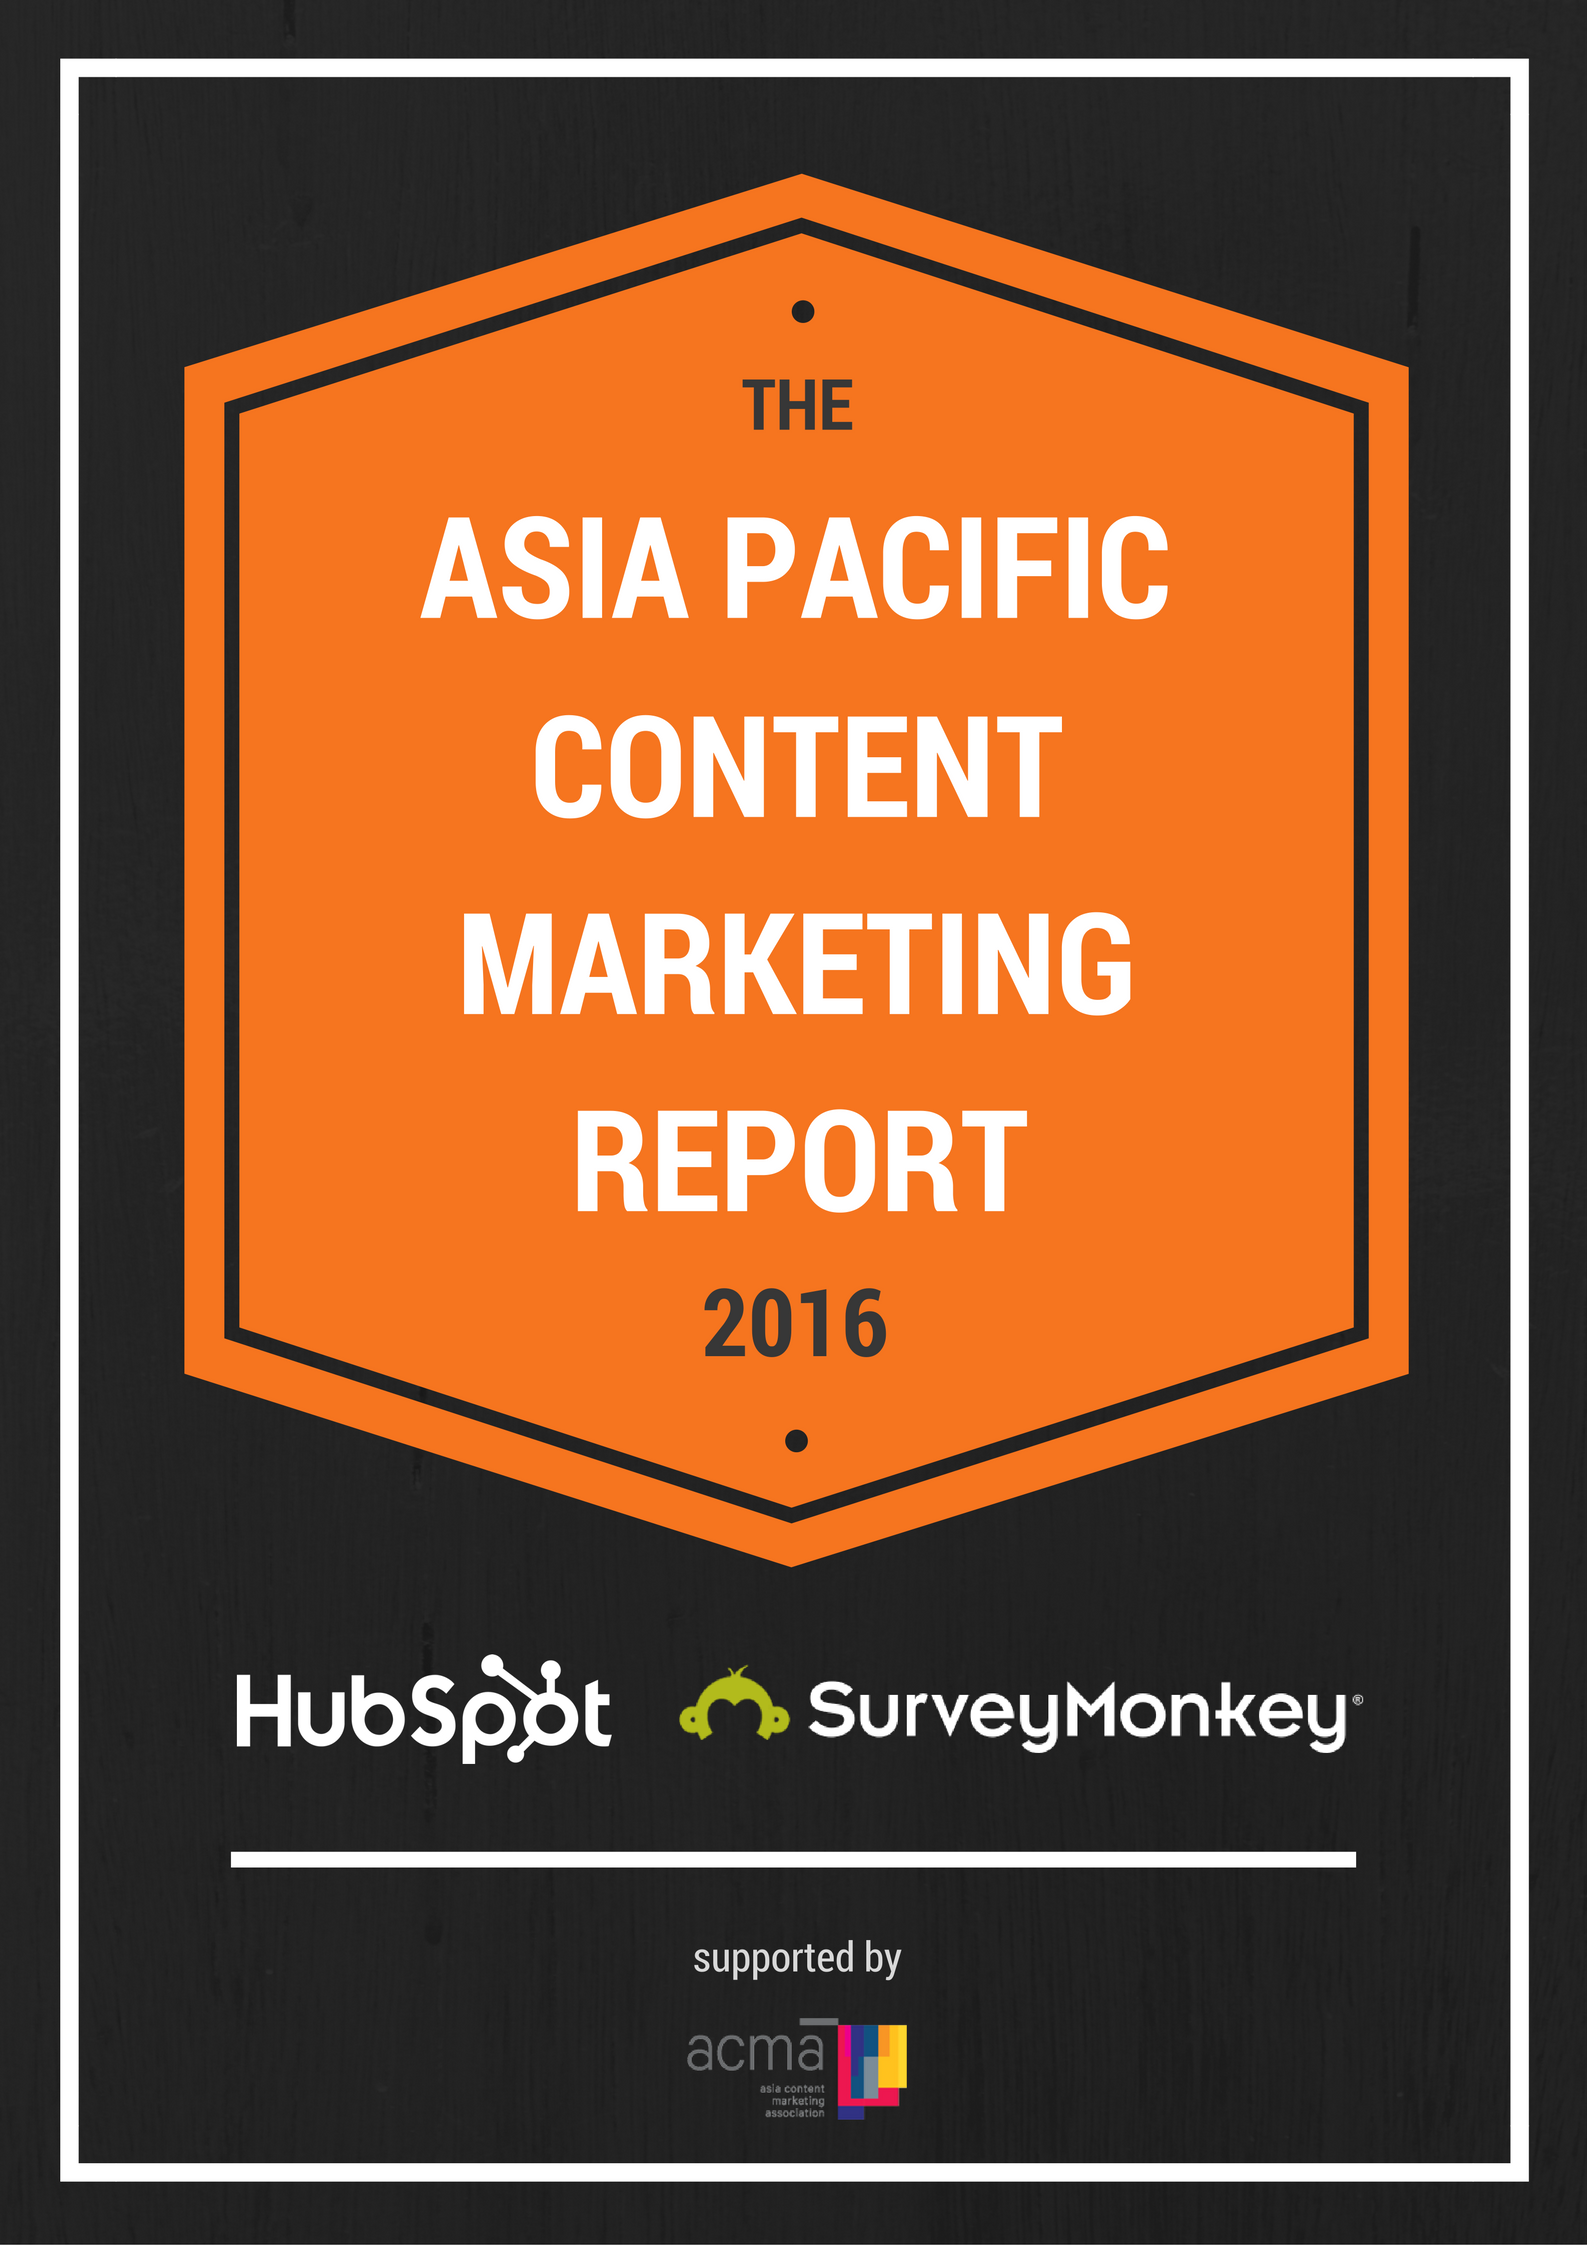 Asia_Pacific_Content_Marketing_Report_2016